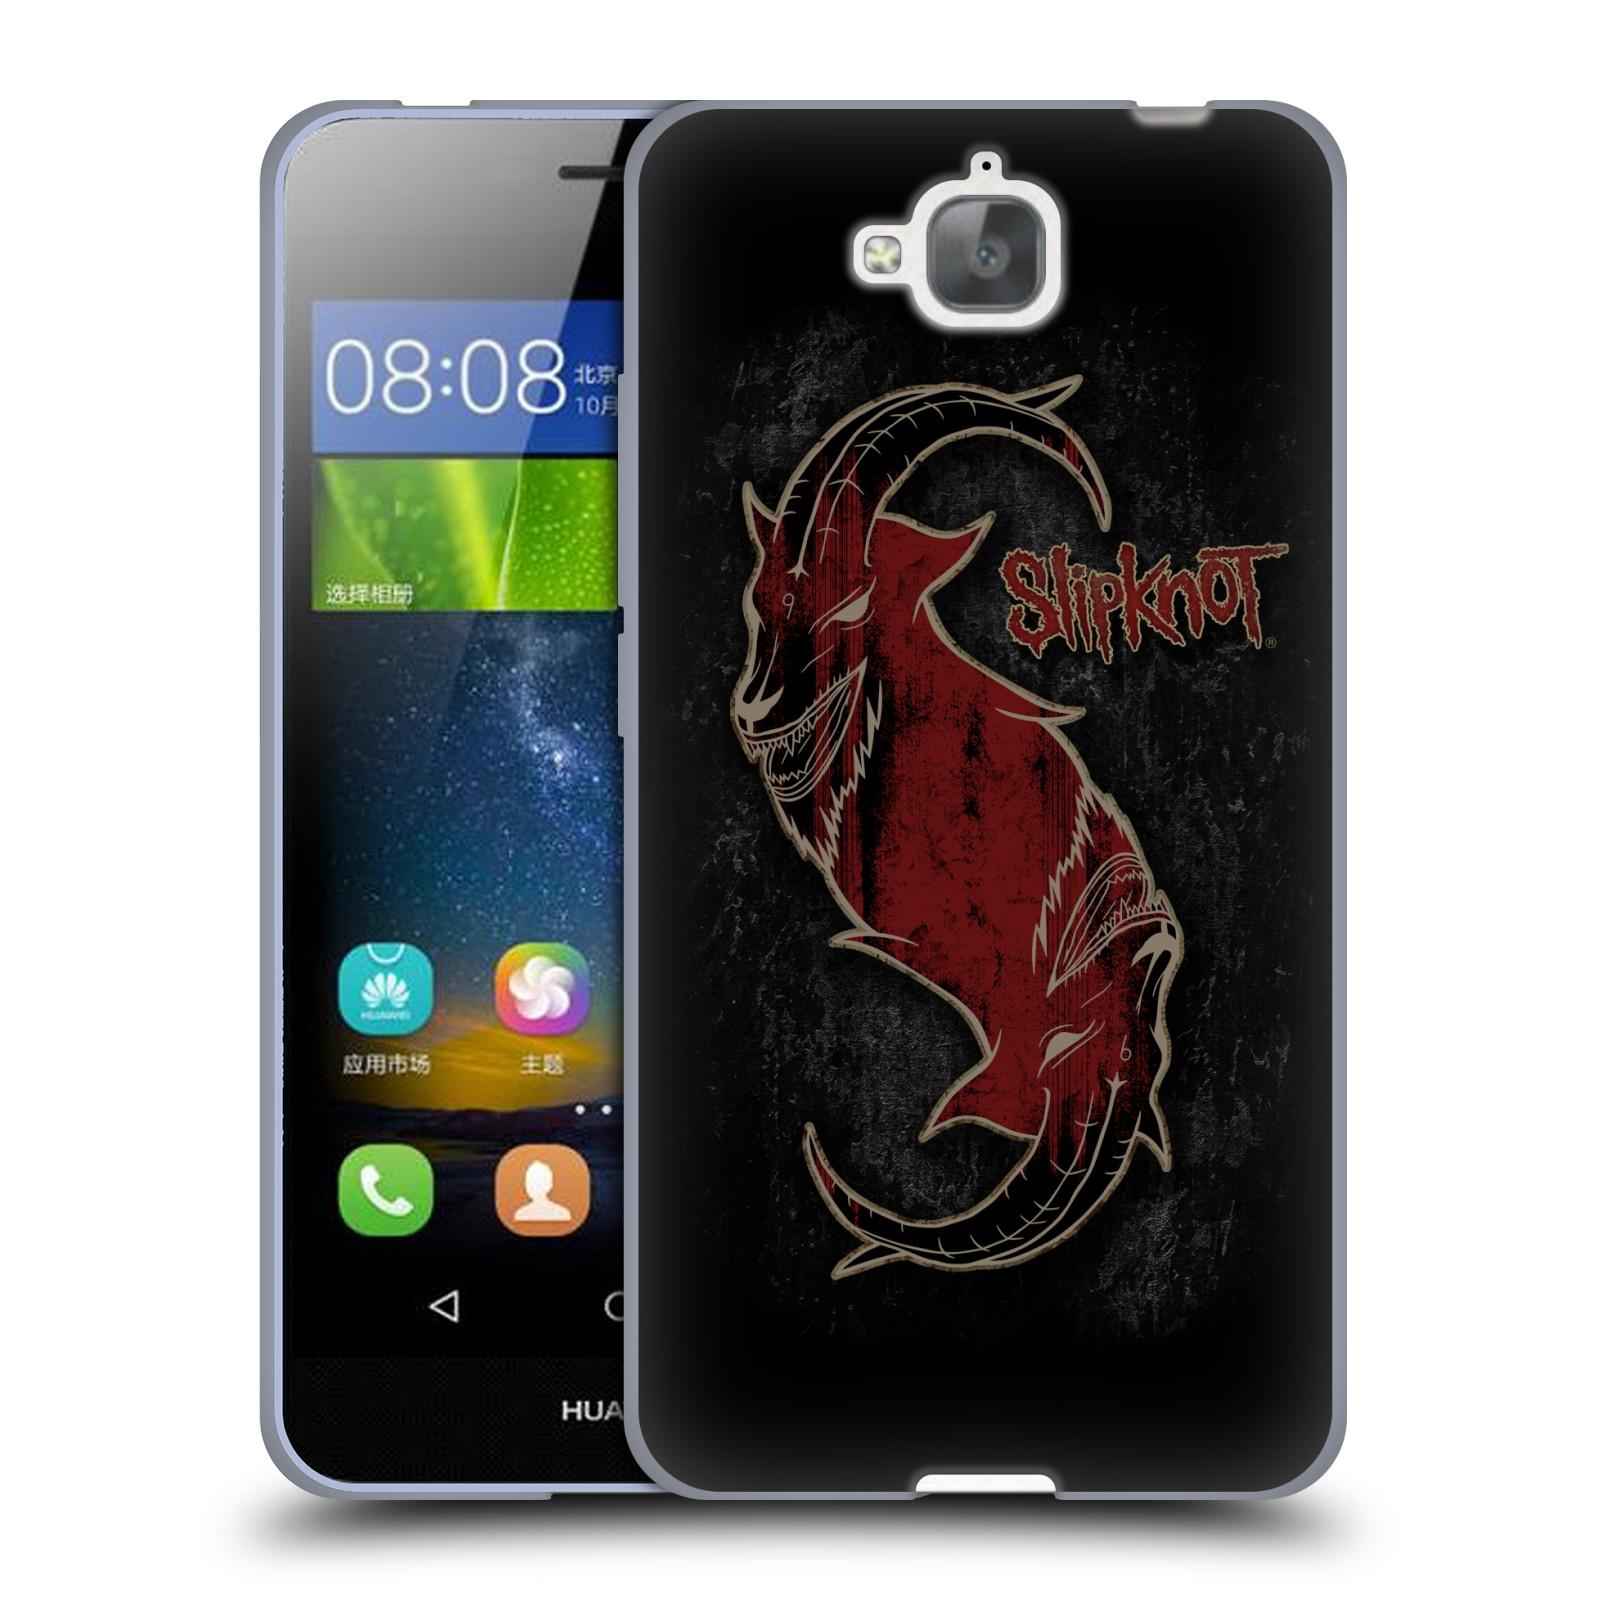 Silikonové pouzdro na mobil Huawei Y6 Pro Dual Sim HEAD CASE Slipknot - Rudý kozel